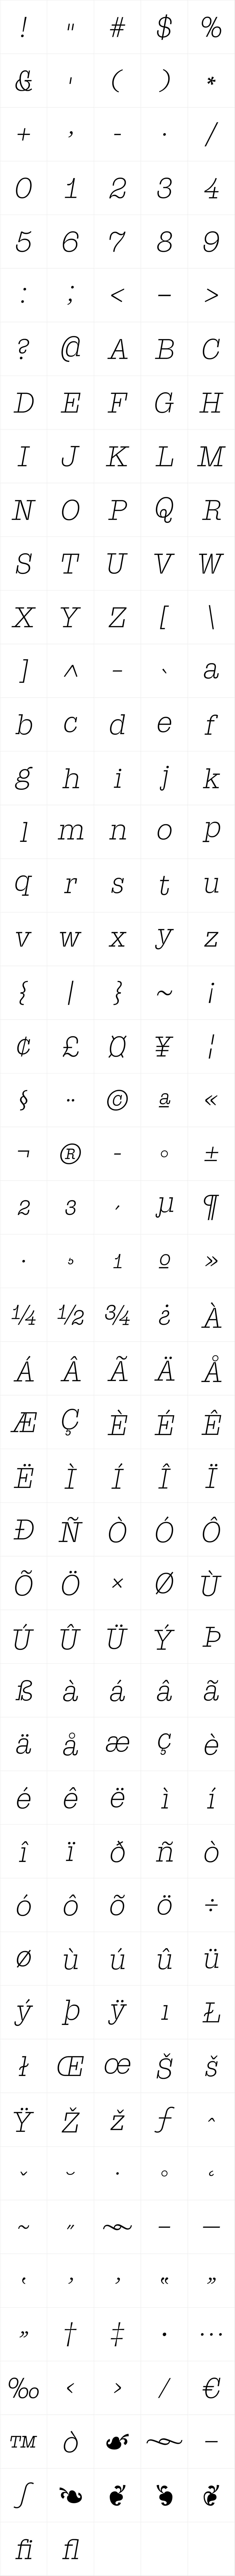 Suomi Slab Serif Light Italic